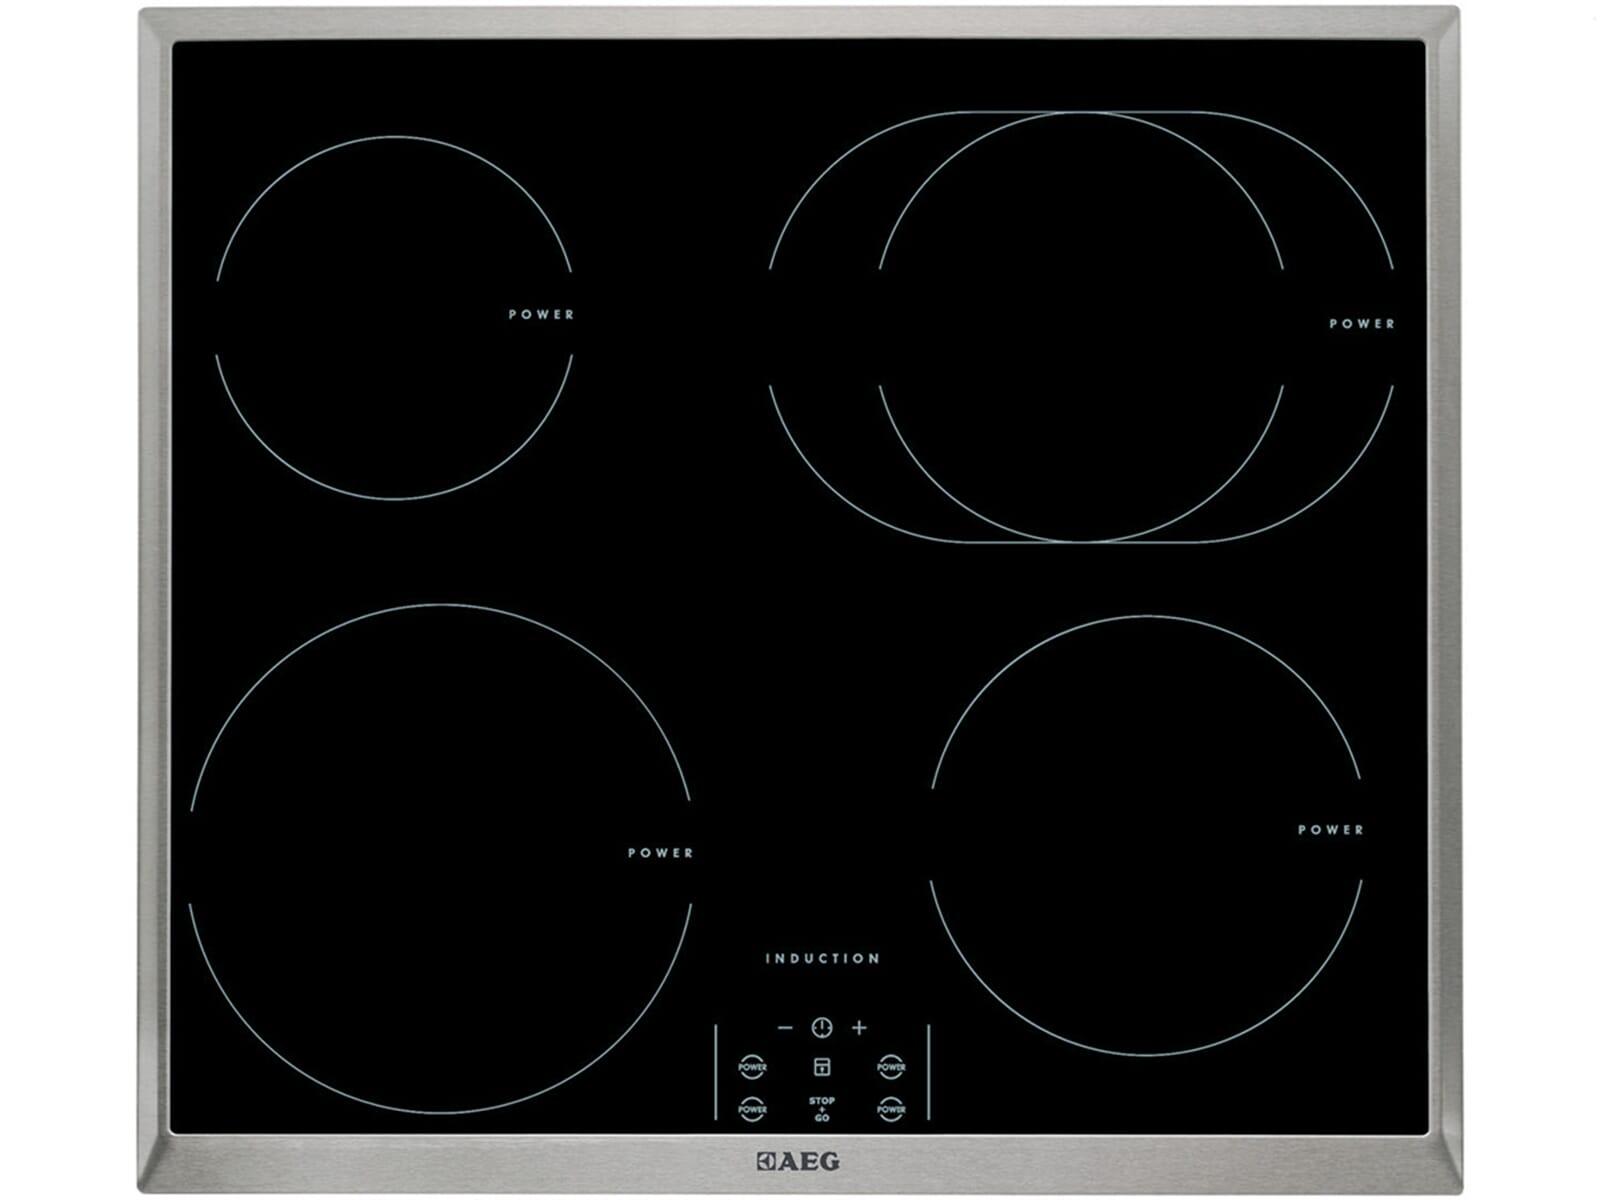 aeg eeb353 set steambake einbau herd eeb351010m + ... - Einbau Küchengeräte Set